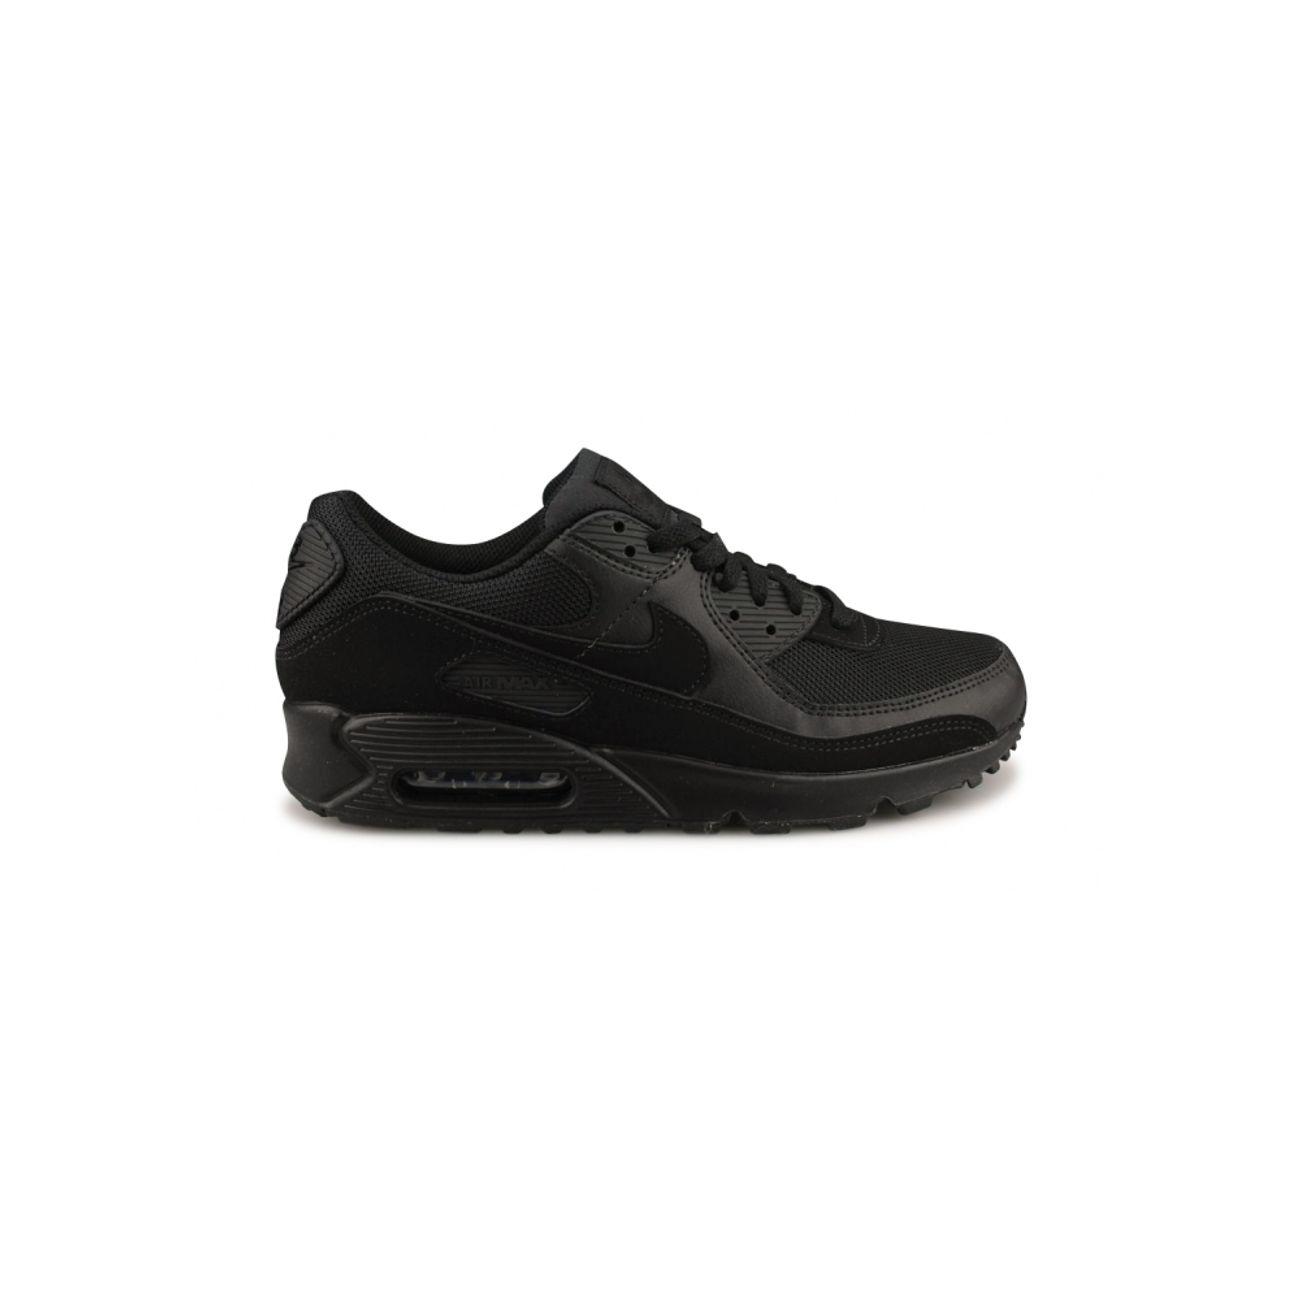 Mode- Lifestyle homme NIKE Basket Nike Air Max 90 Noir Cn8490-003